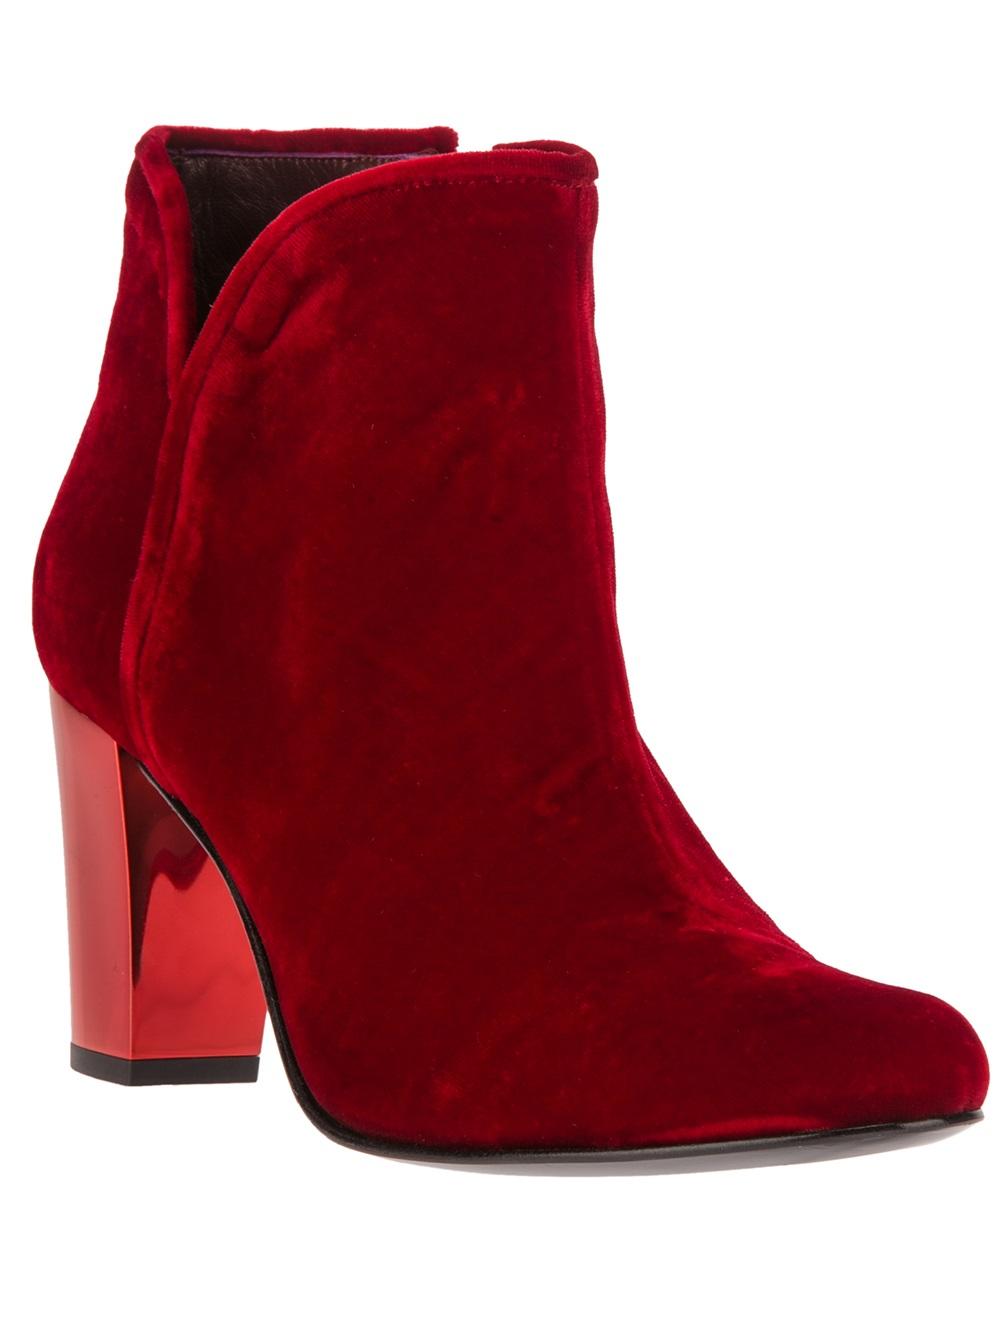 Opening Ceremony Velvet Ankle Boot In Red Lyst